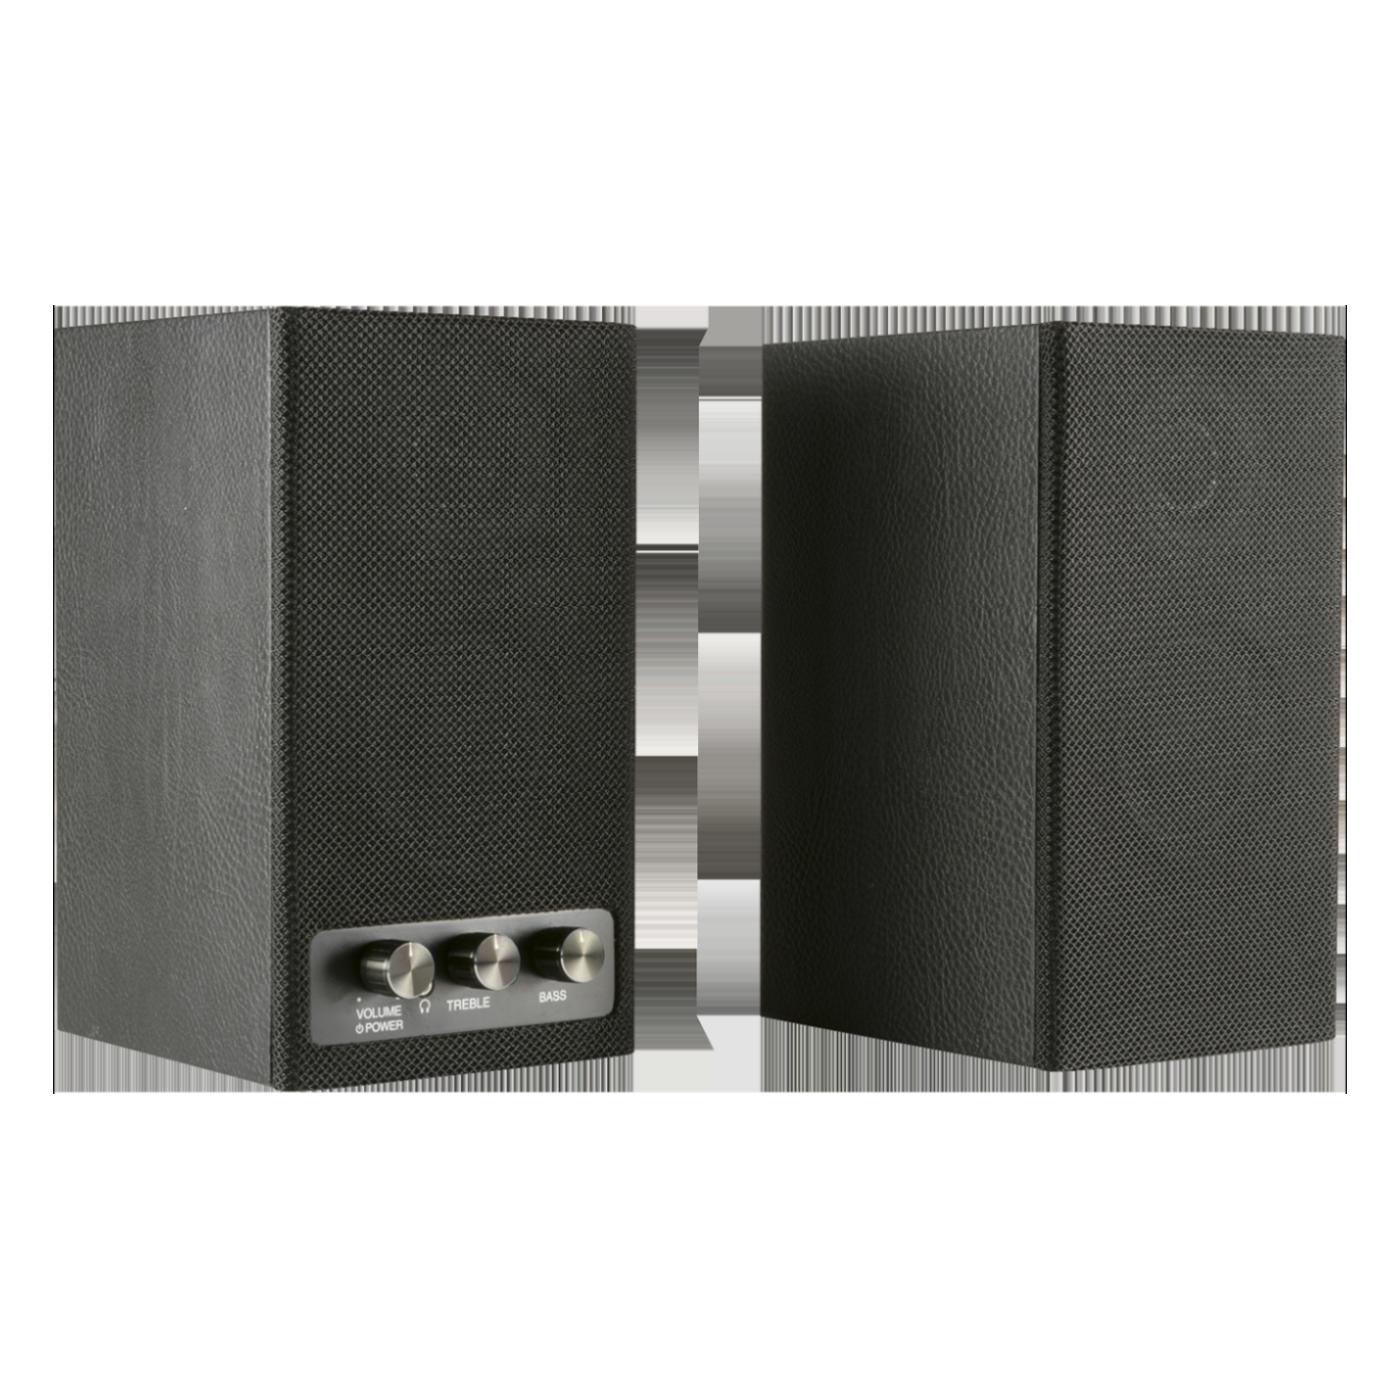 Zvučnik bežični, Bluetooth, set, AUX